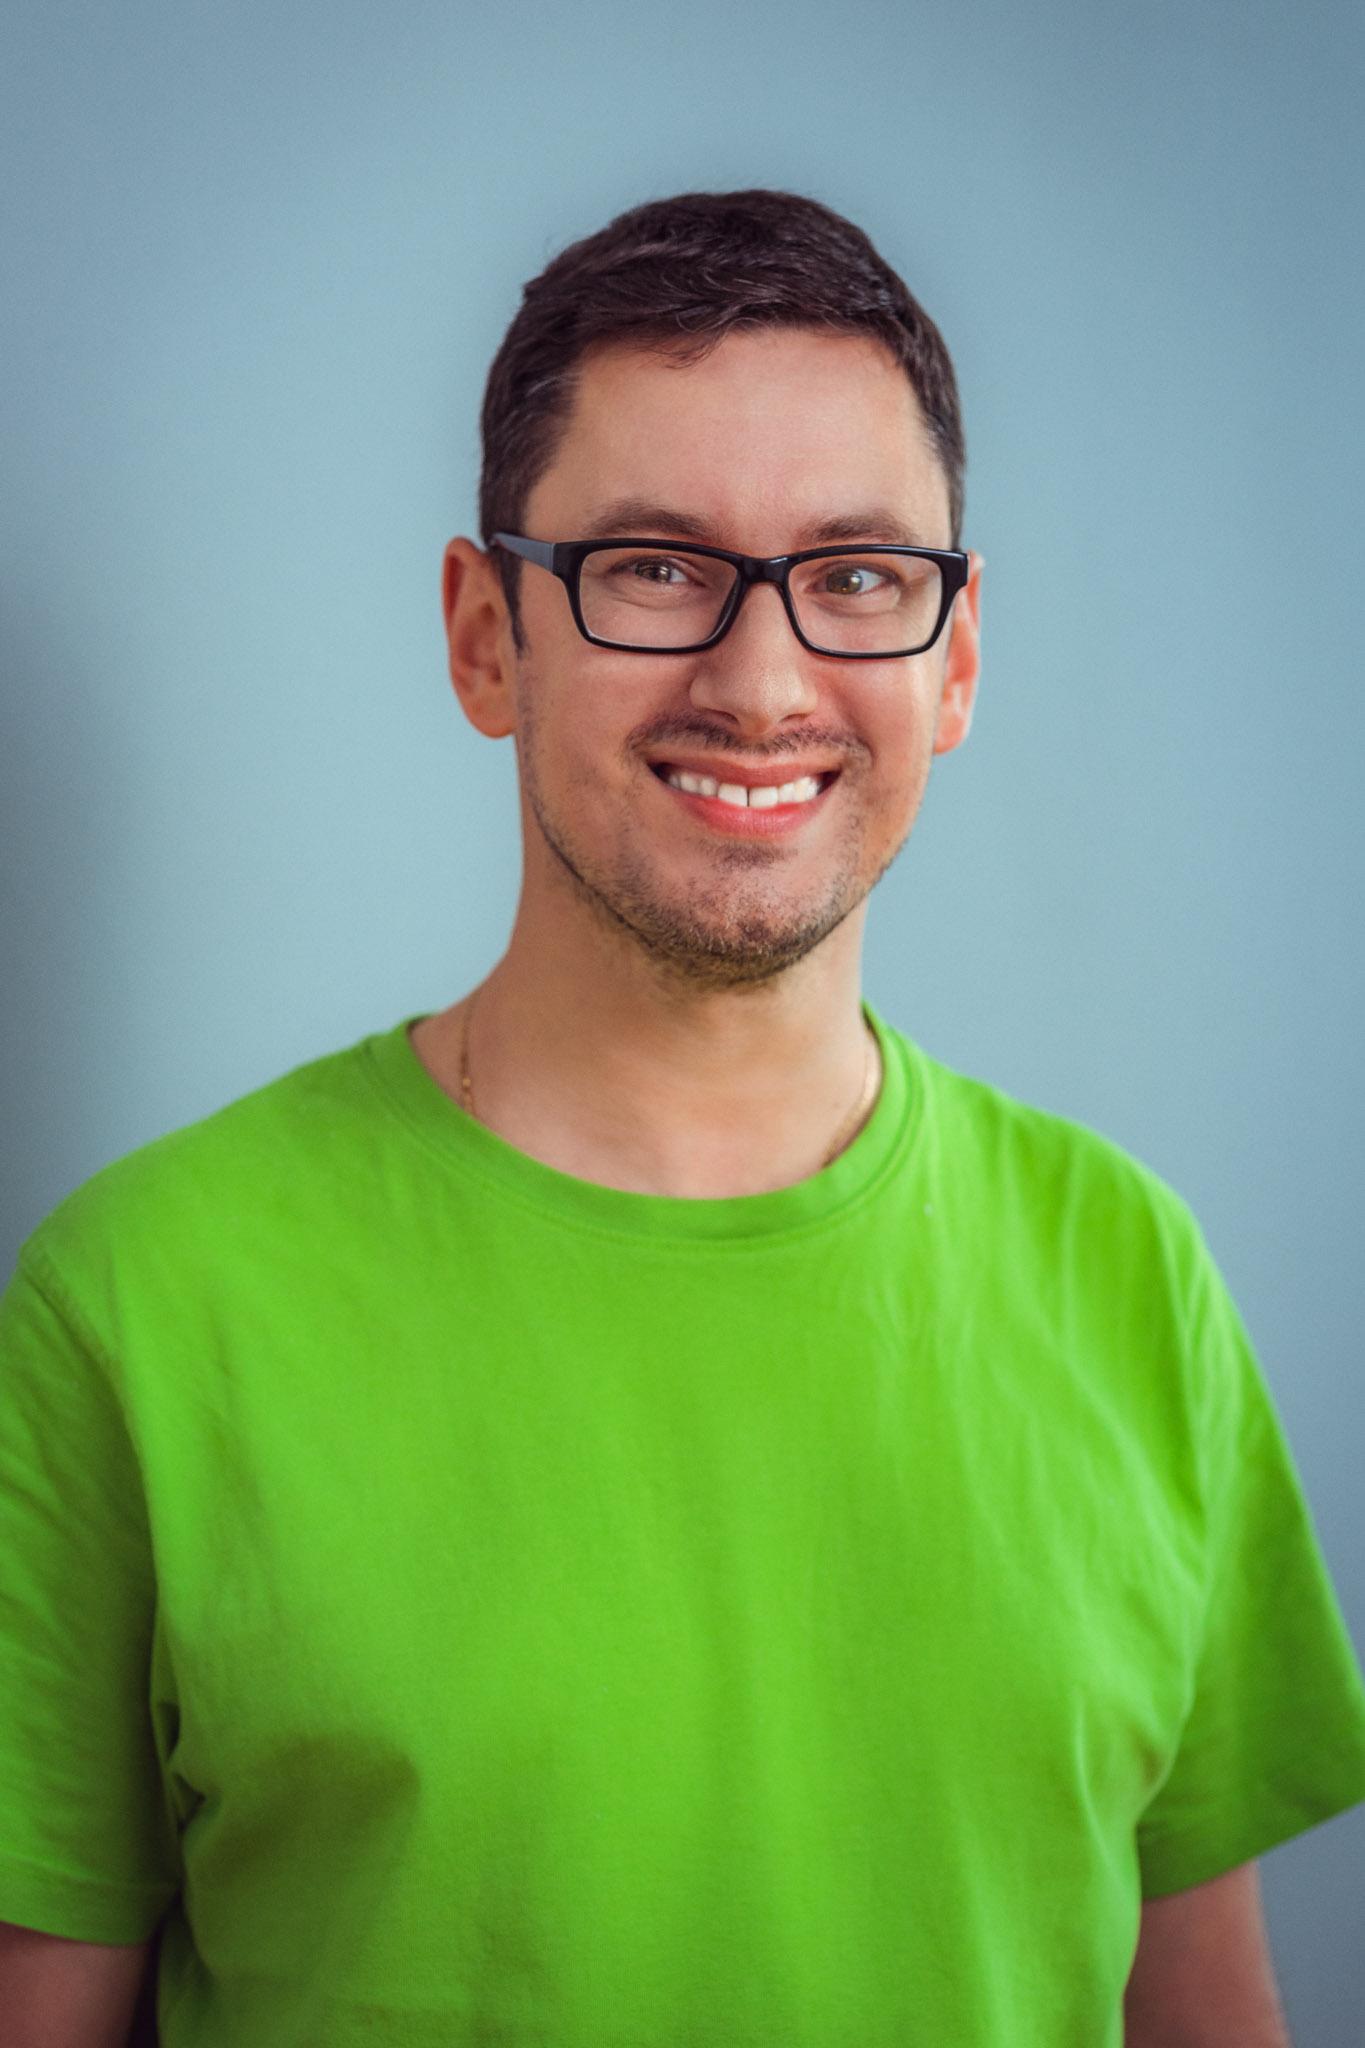 Mitarbeiterfoto 07.2021 Andreas Klasik web